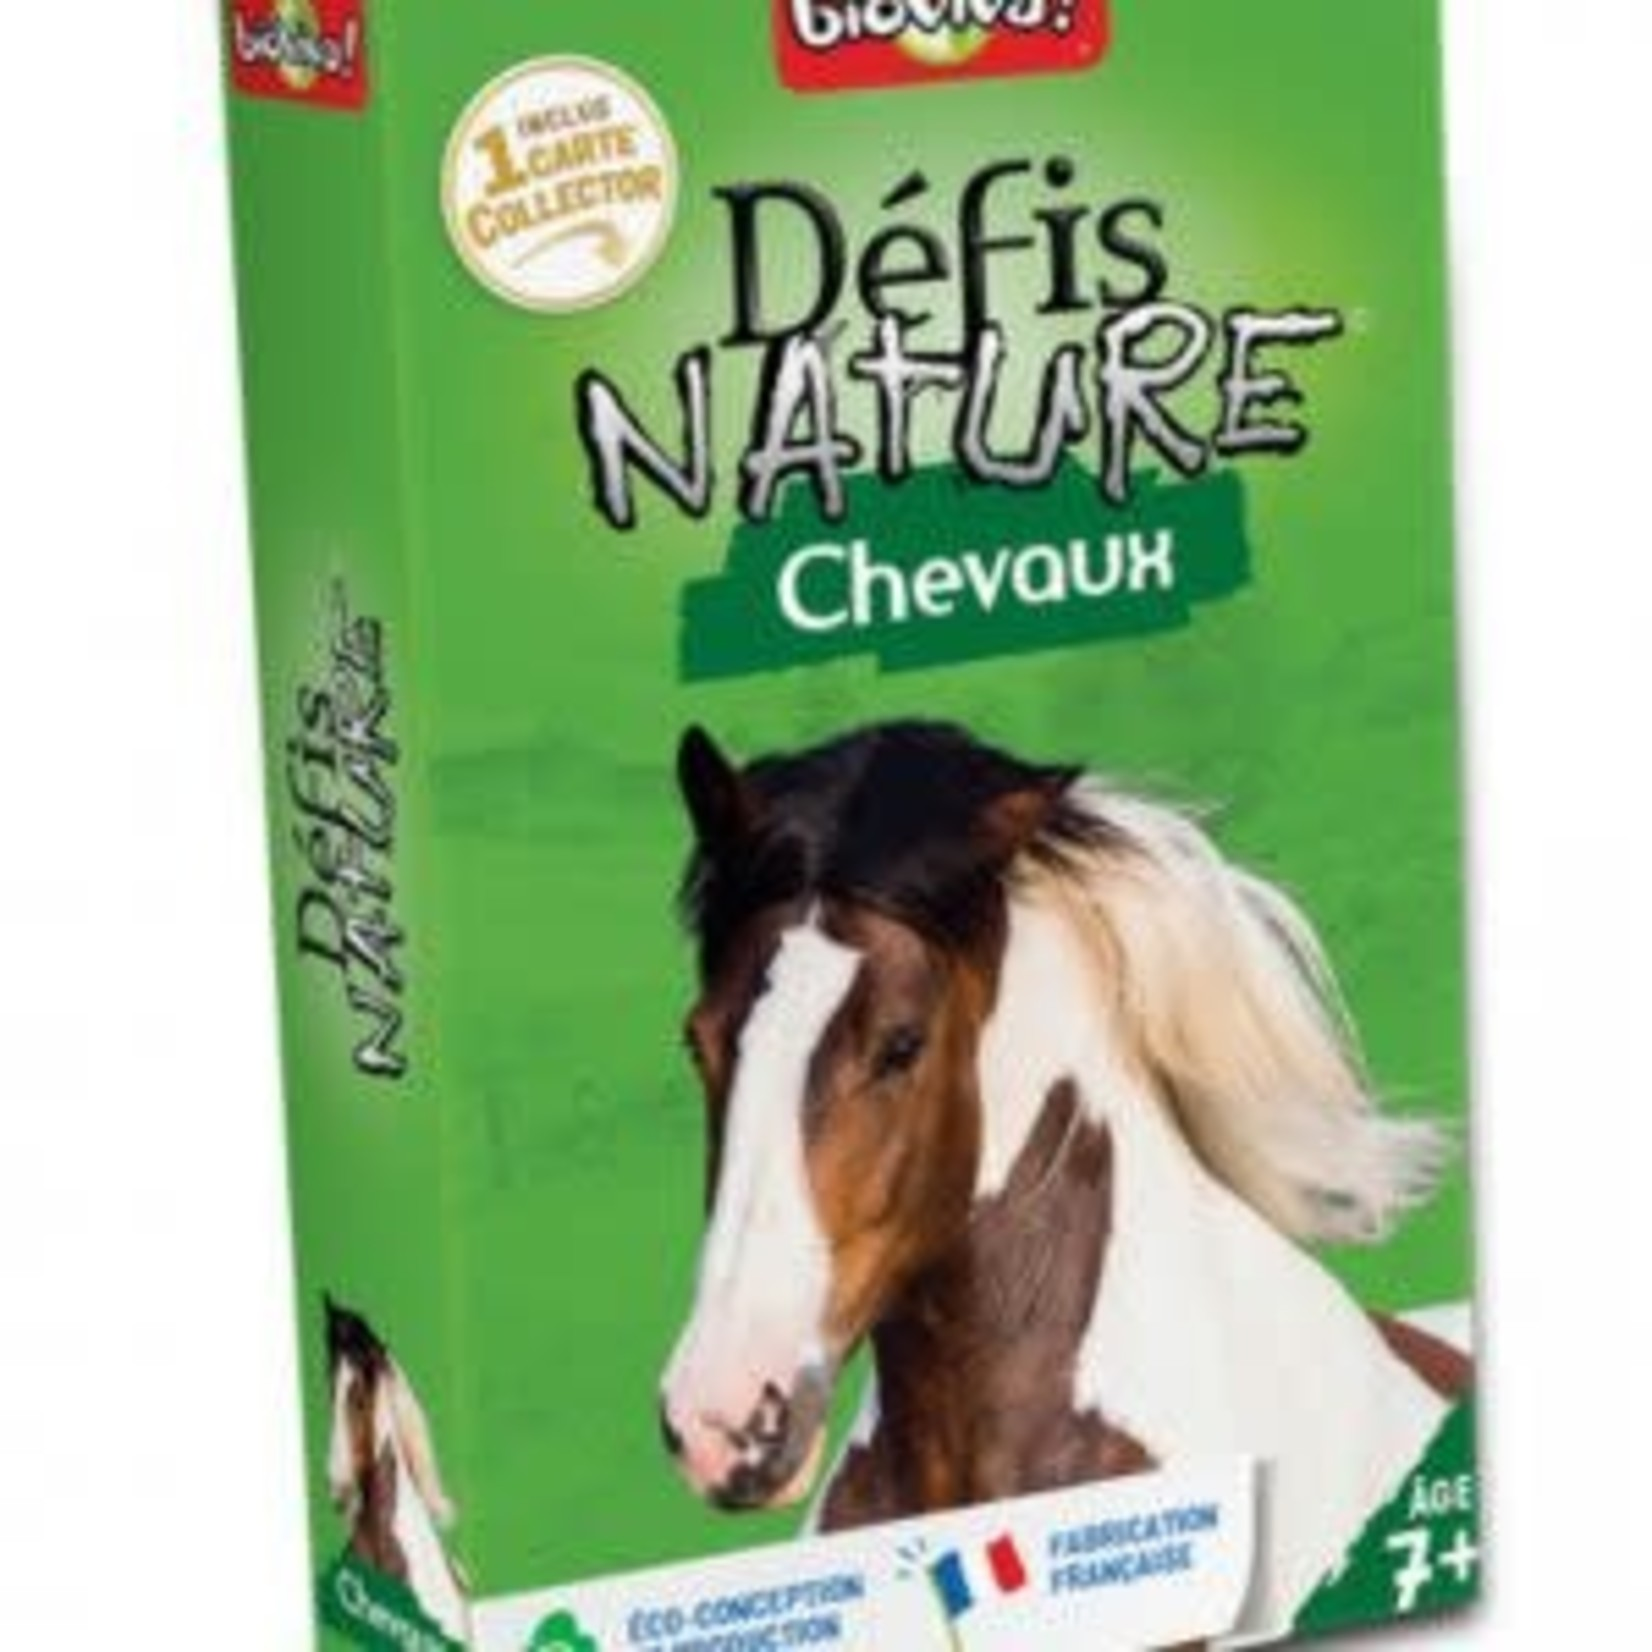 Bioviva Défis Nature - Chevaux